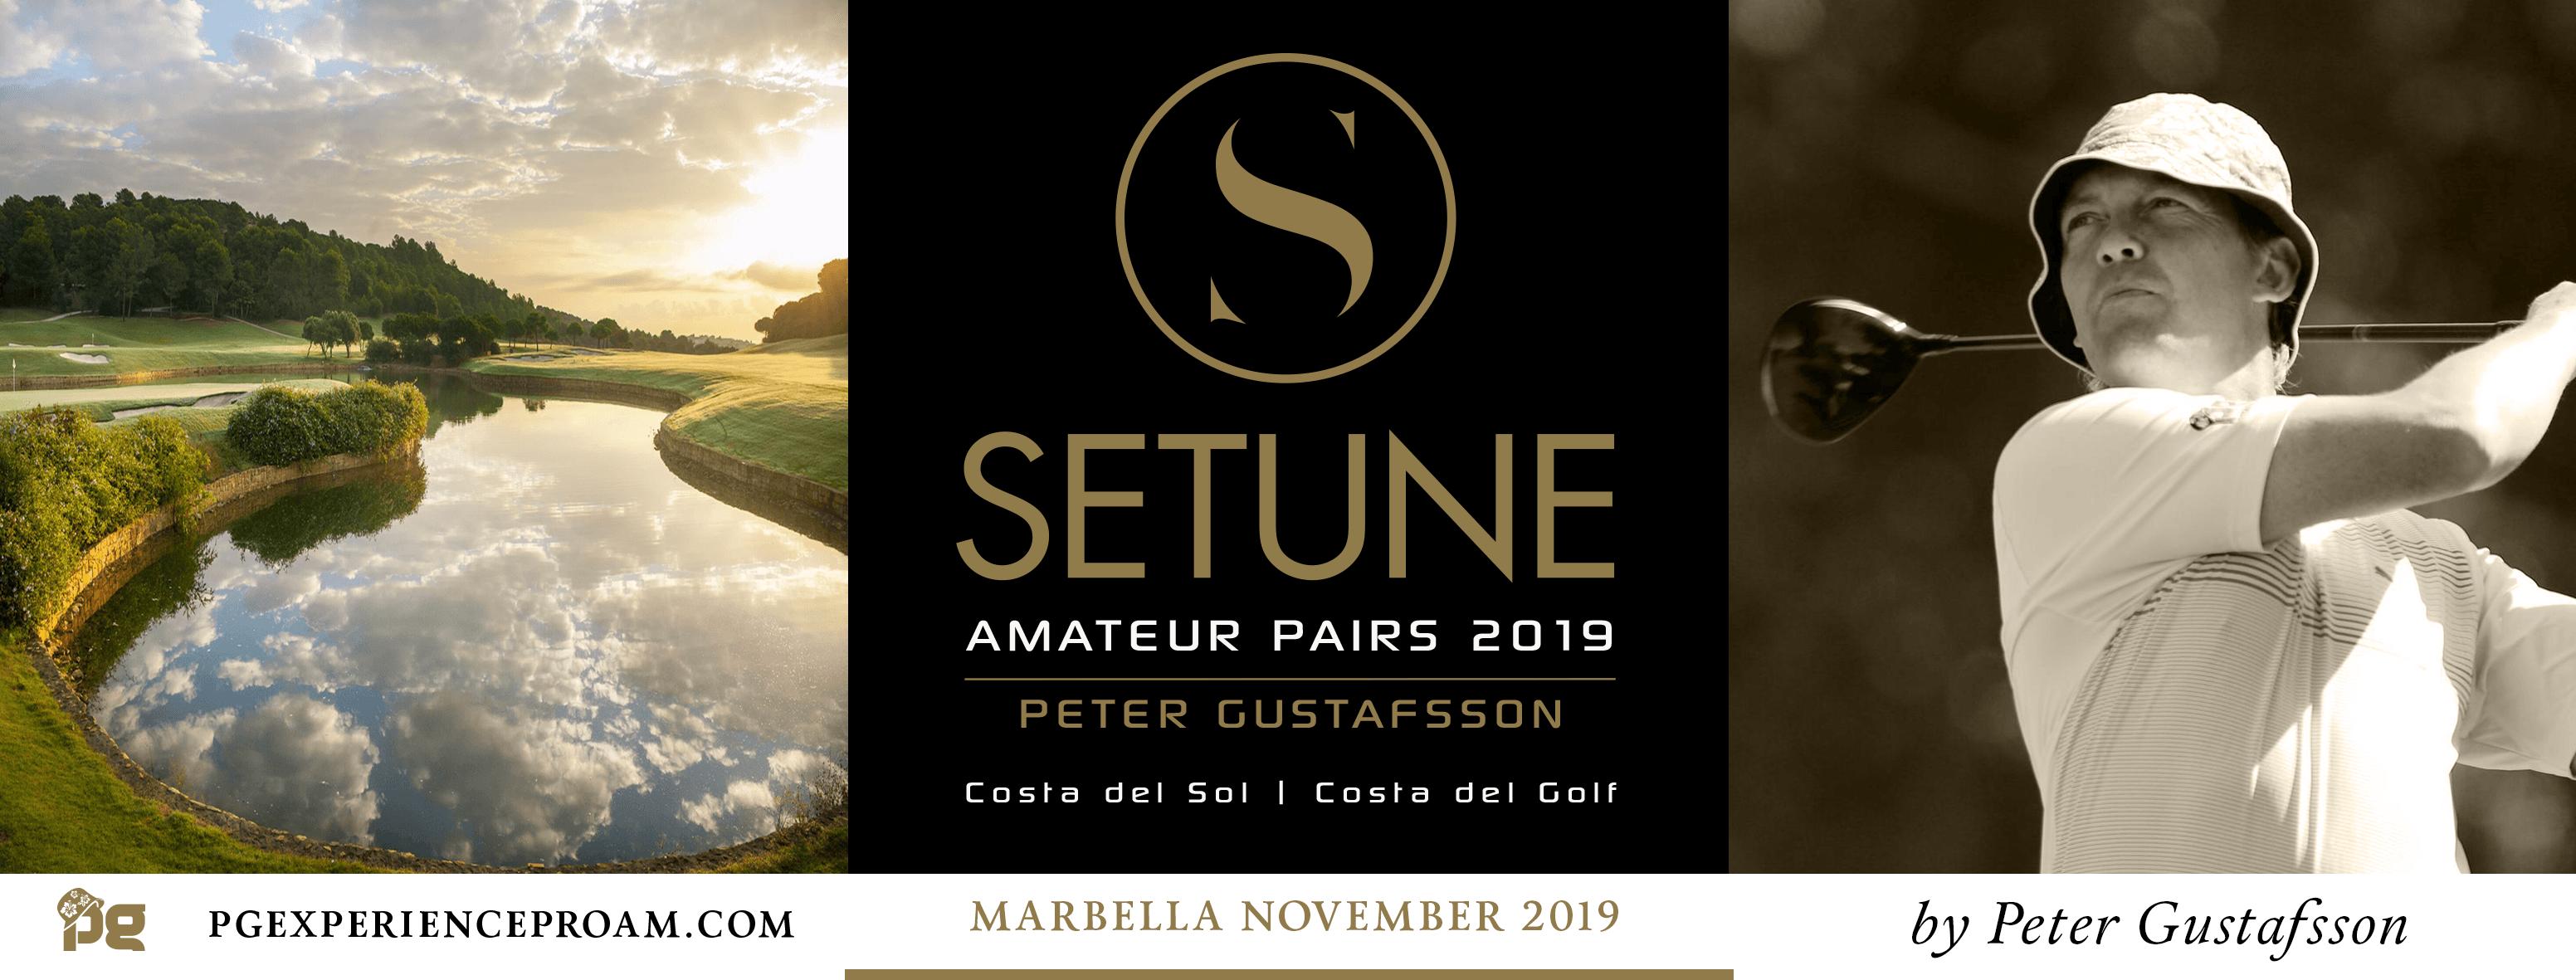 Setune Amateur Pairs 2019